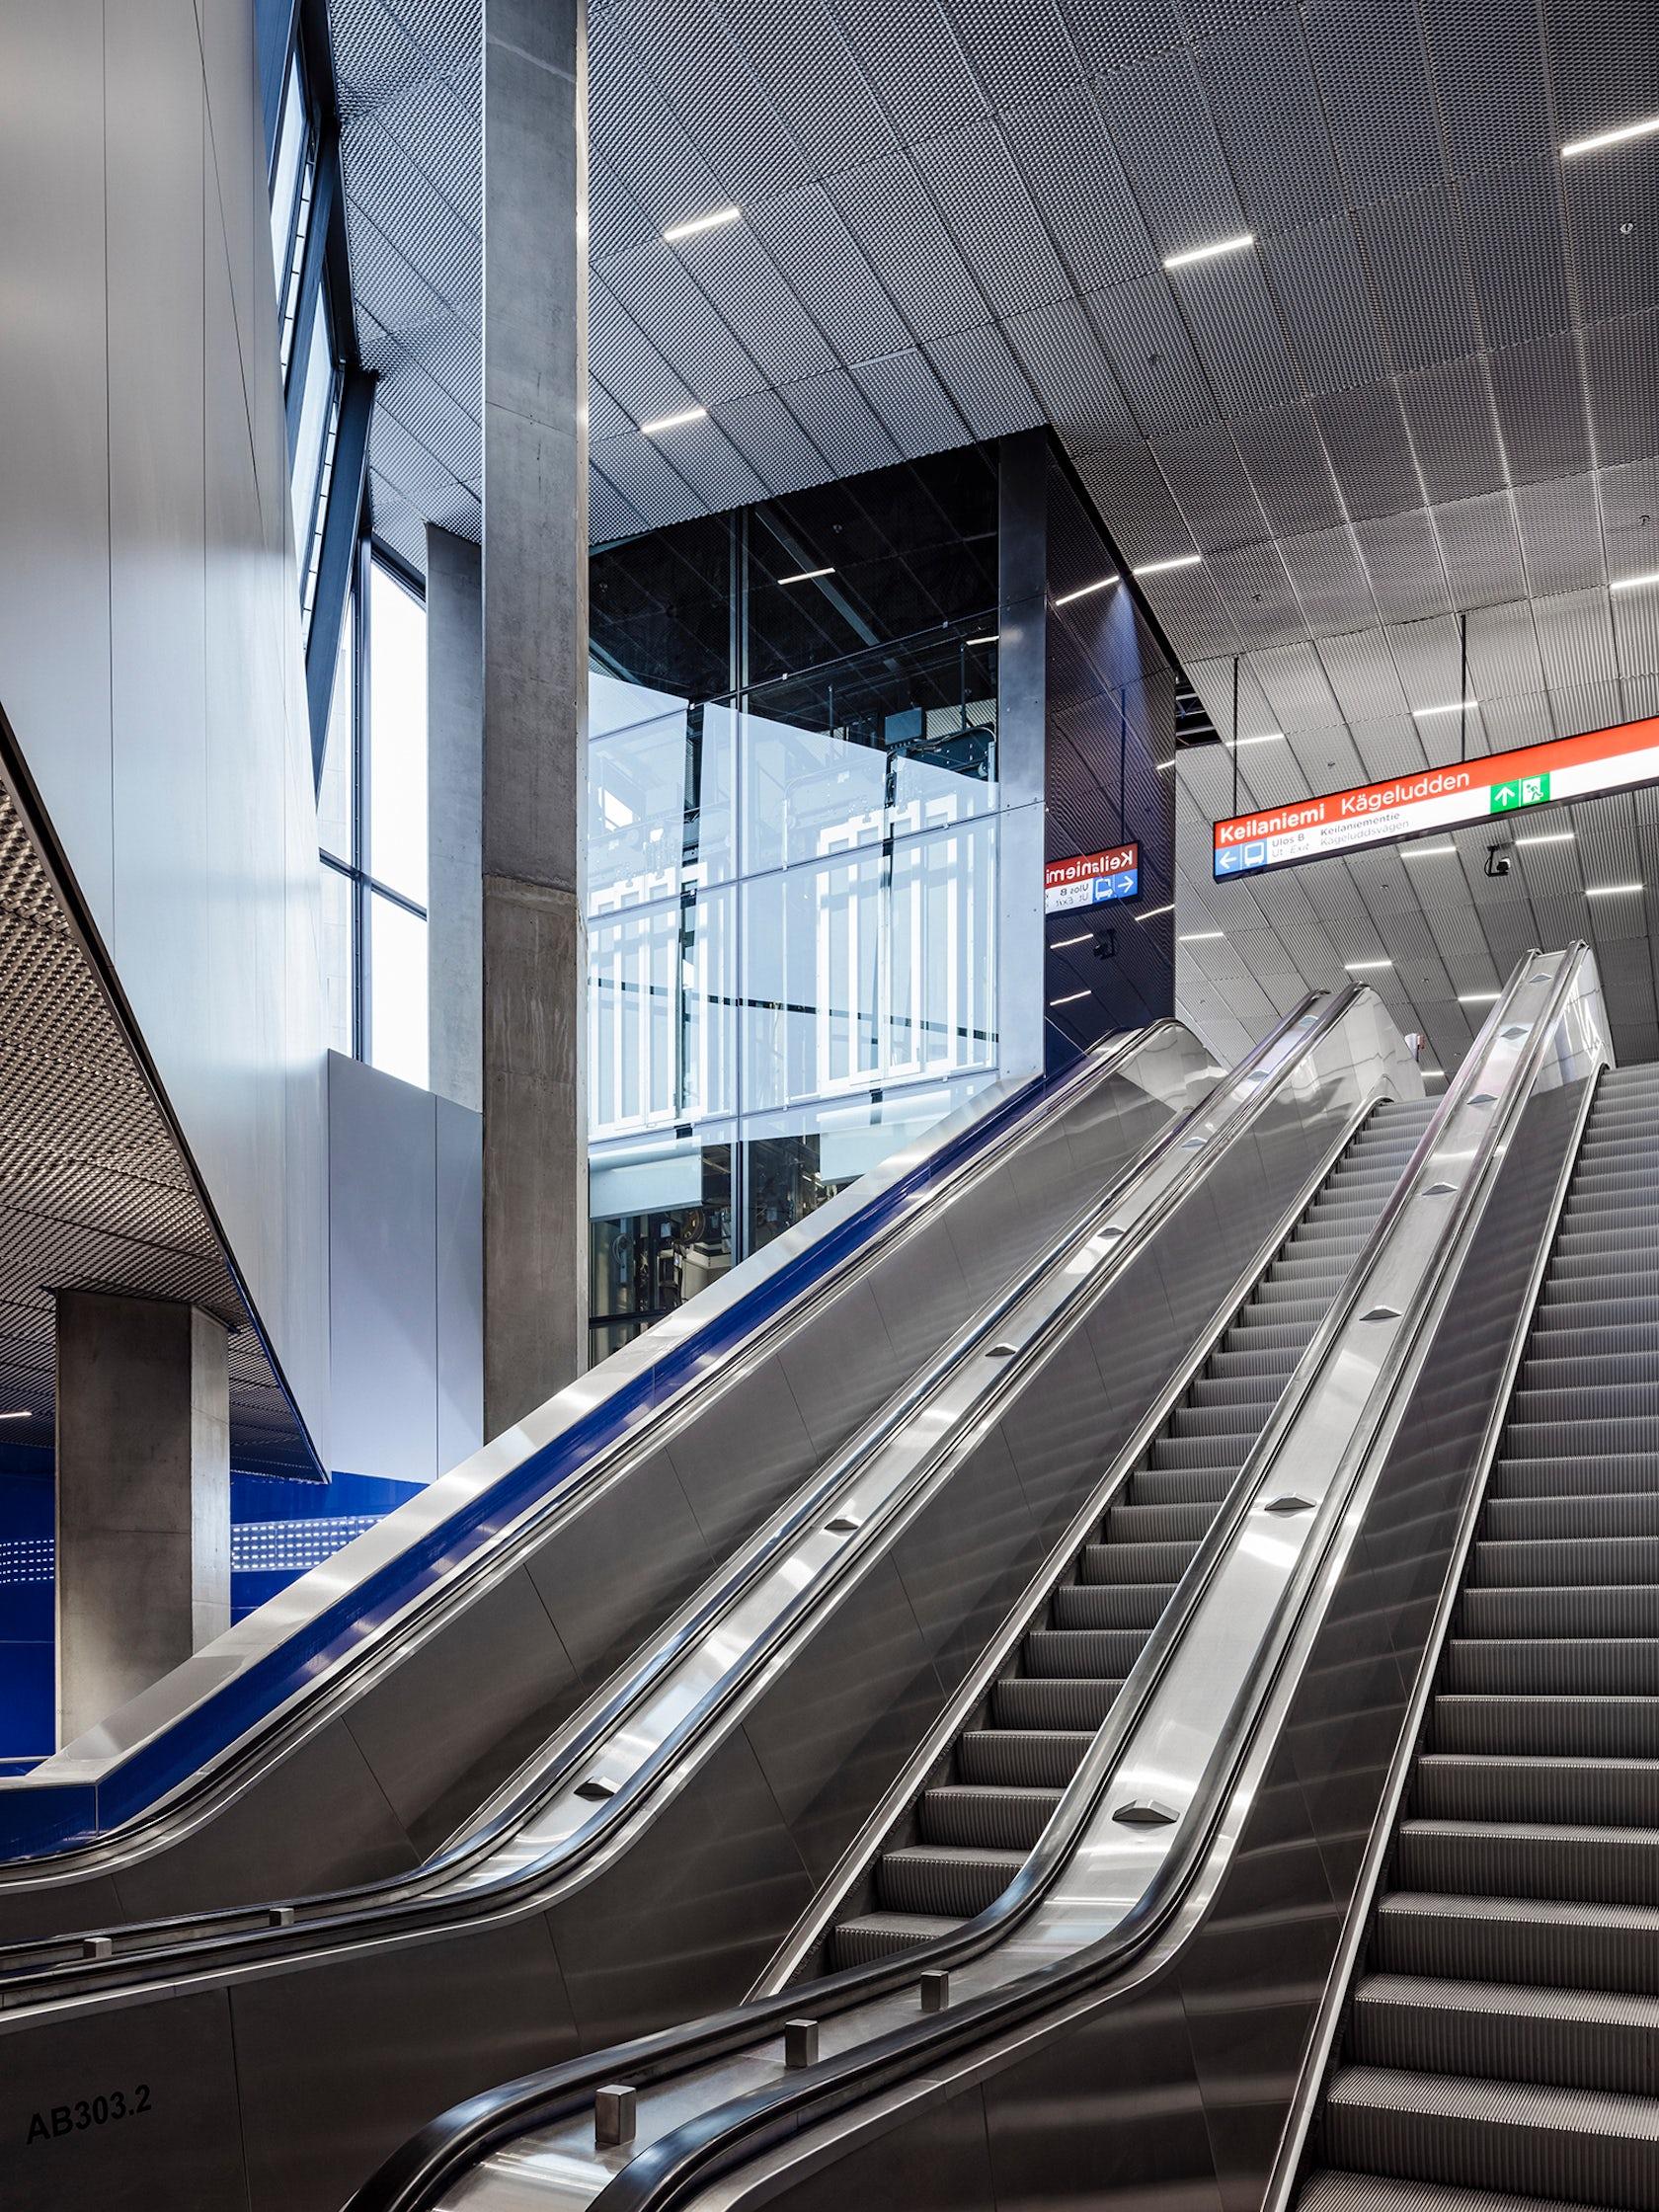 Metro Kuopio